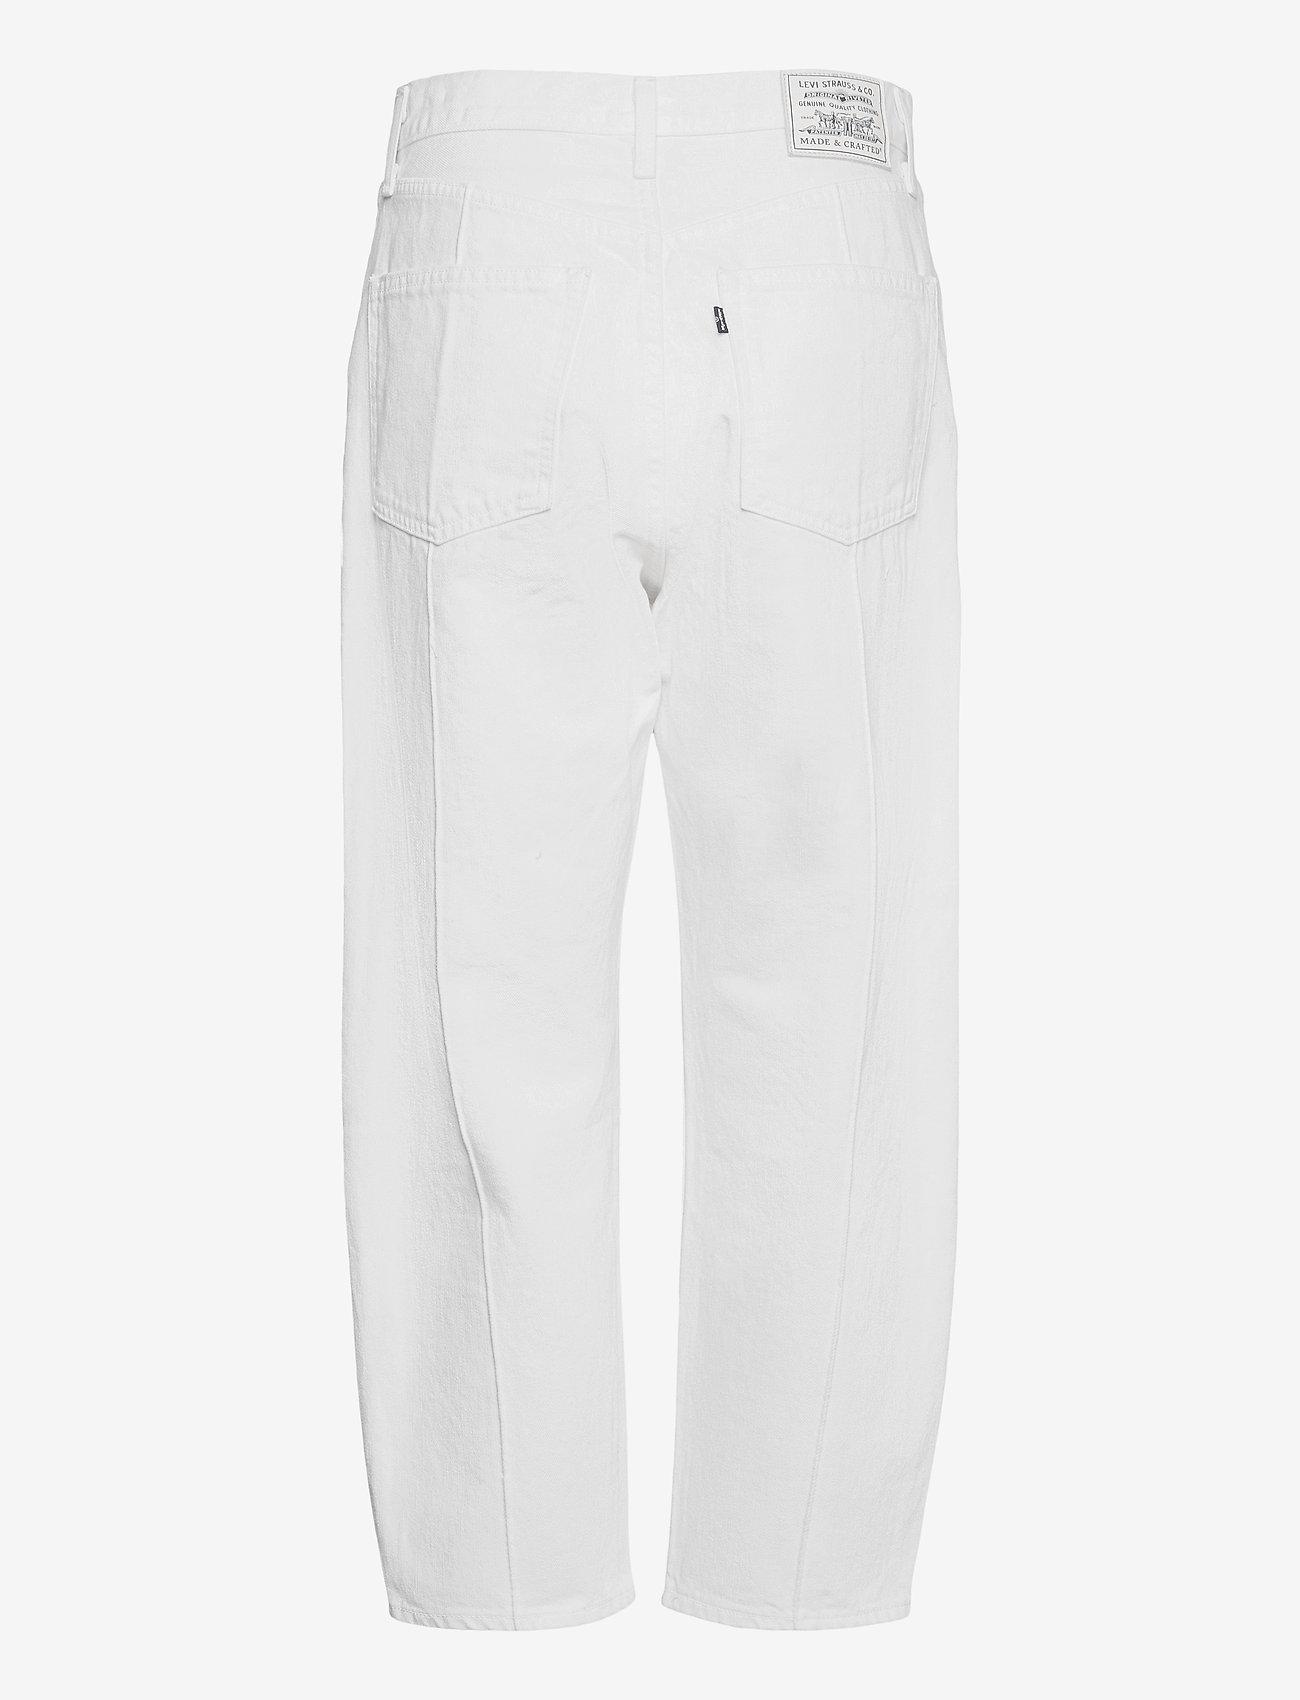 Levi's Made & Crafted - LMC BARREL LMC WHITE SAILS MOJ - mom jeans - neutrals - 1